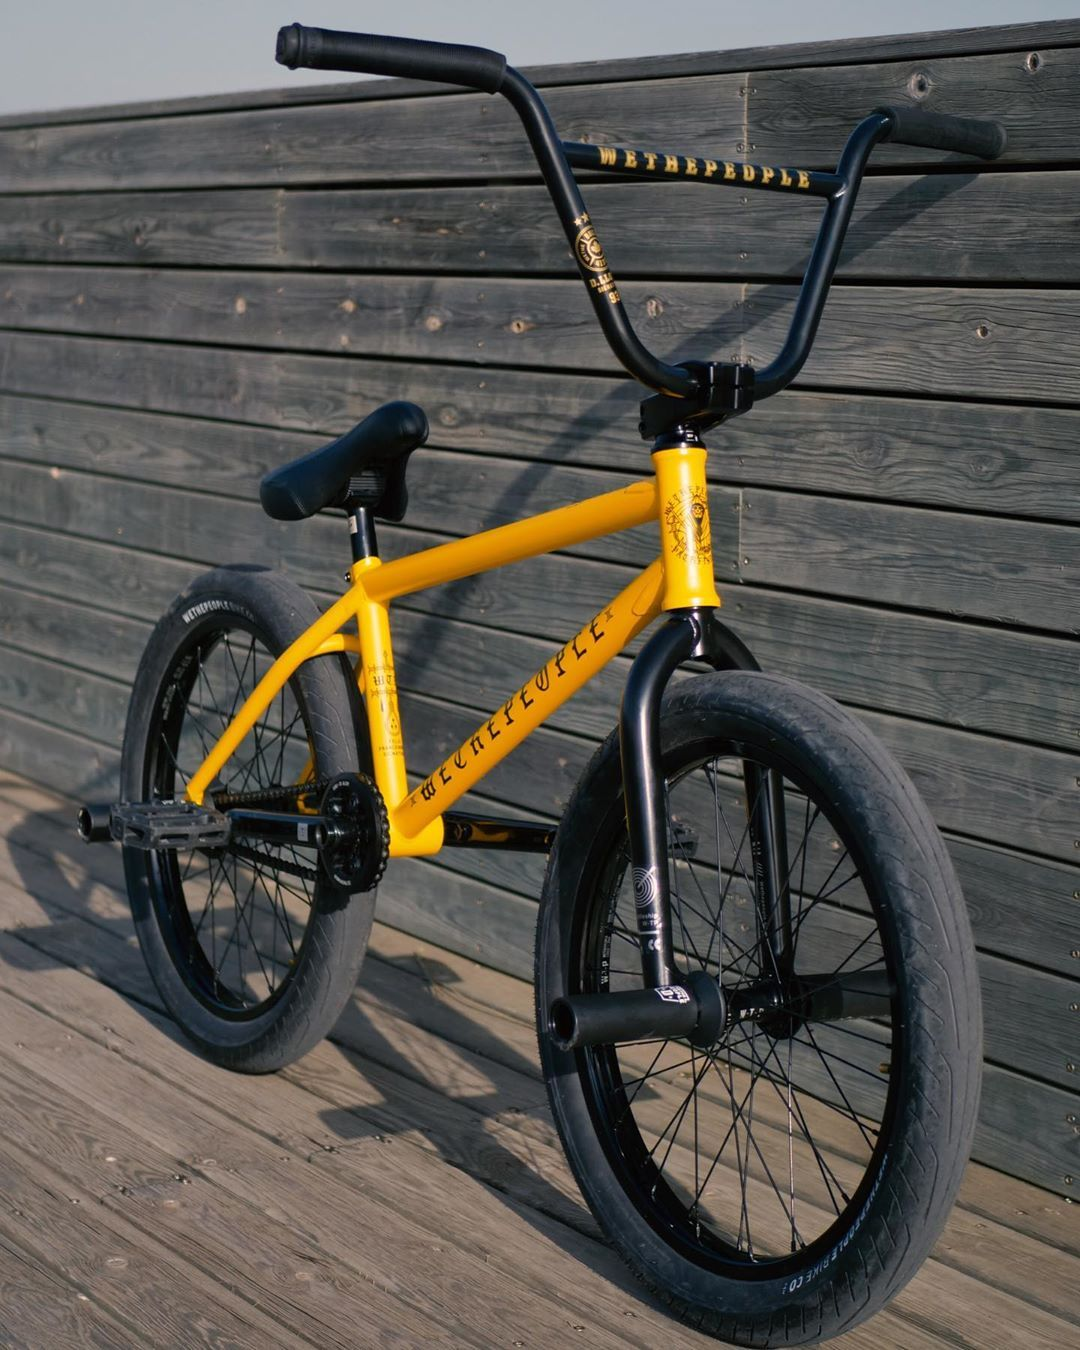 We The People Pathfinder V2 Frame Felix Prangenberg In 2020 Bmx Bikes Bmx Bicycle Bmx Cycles